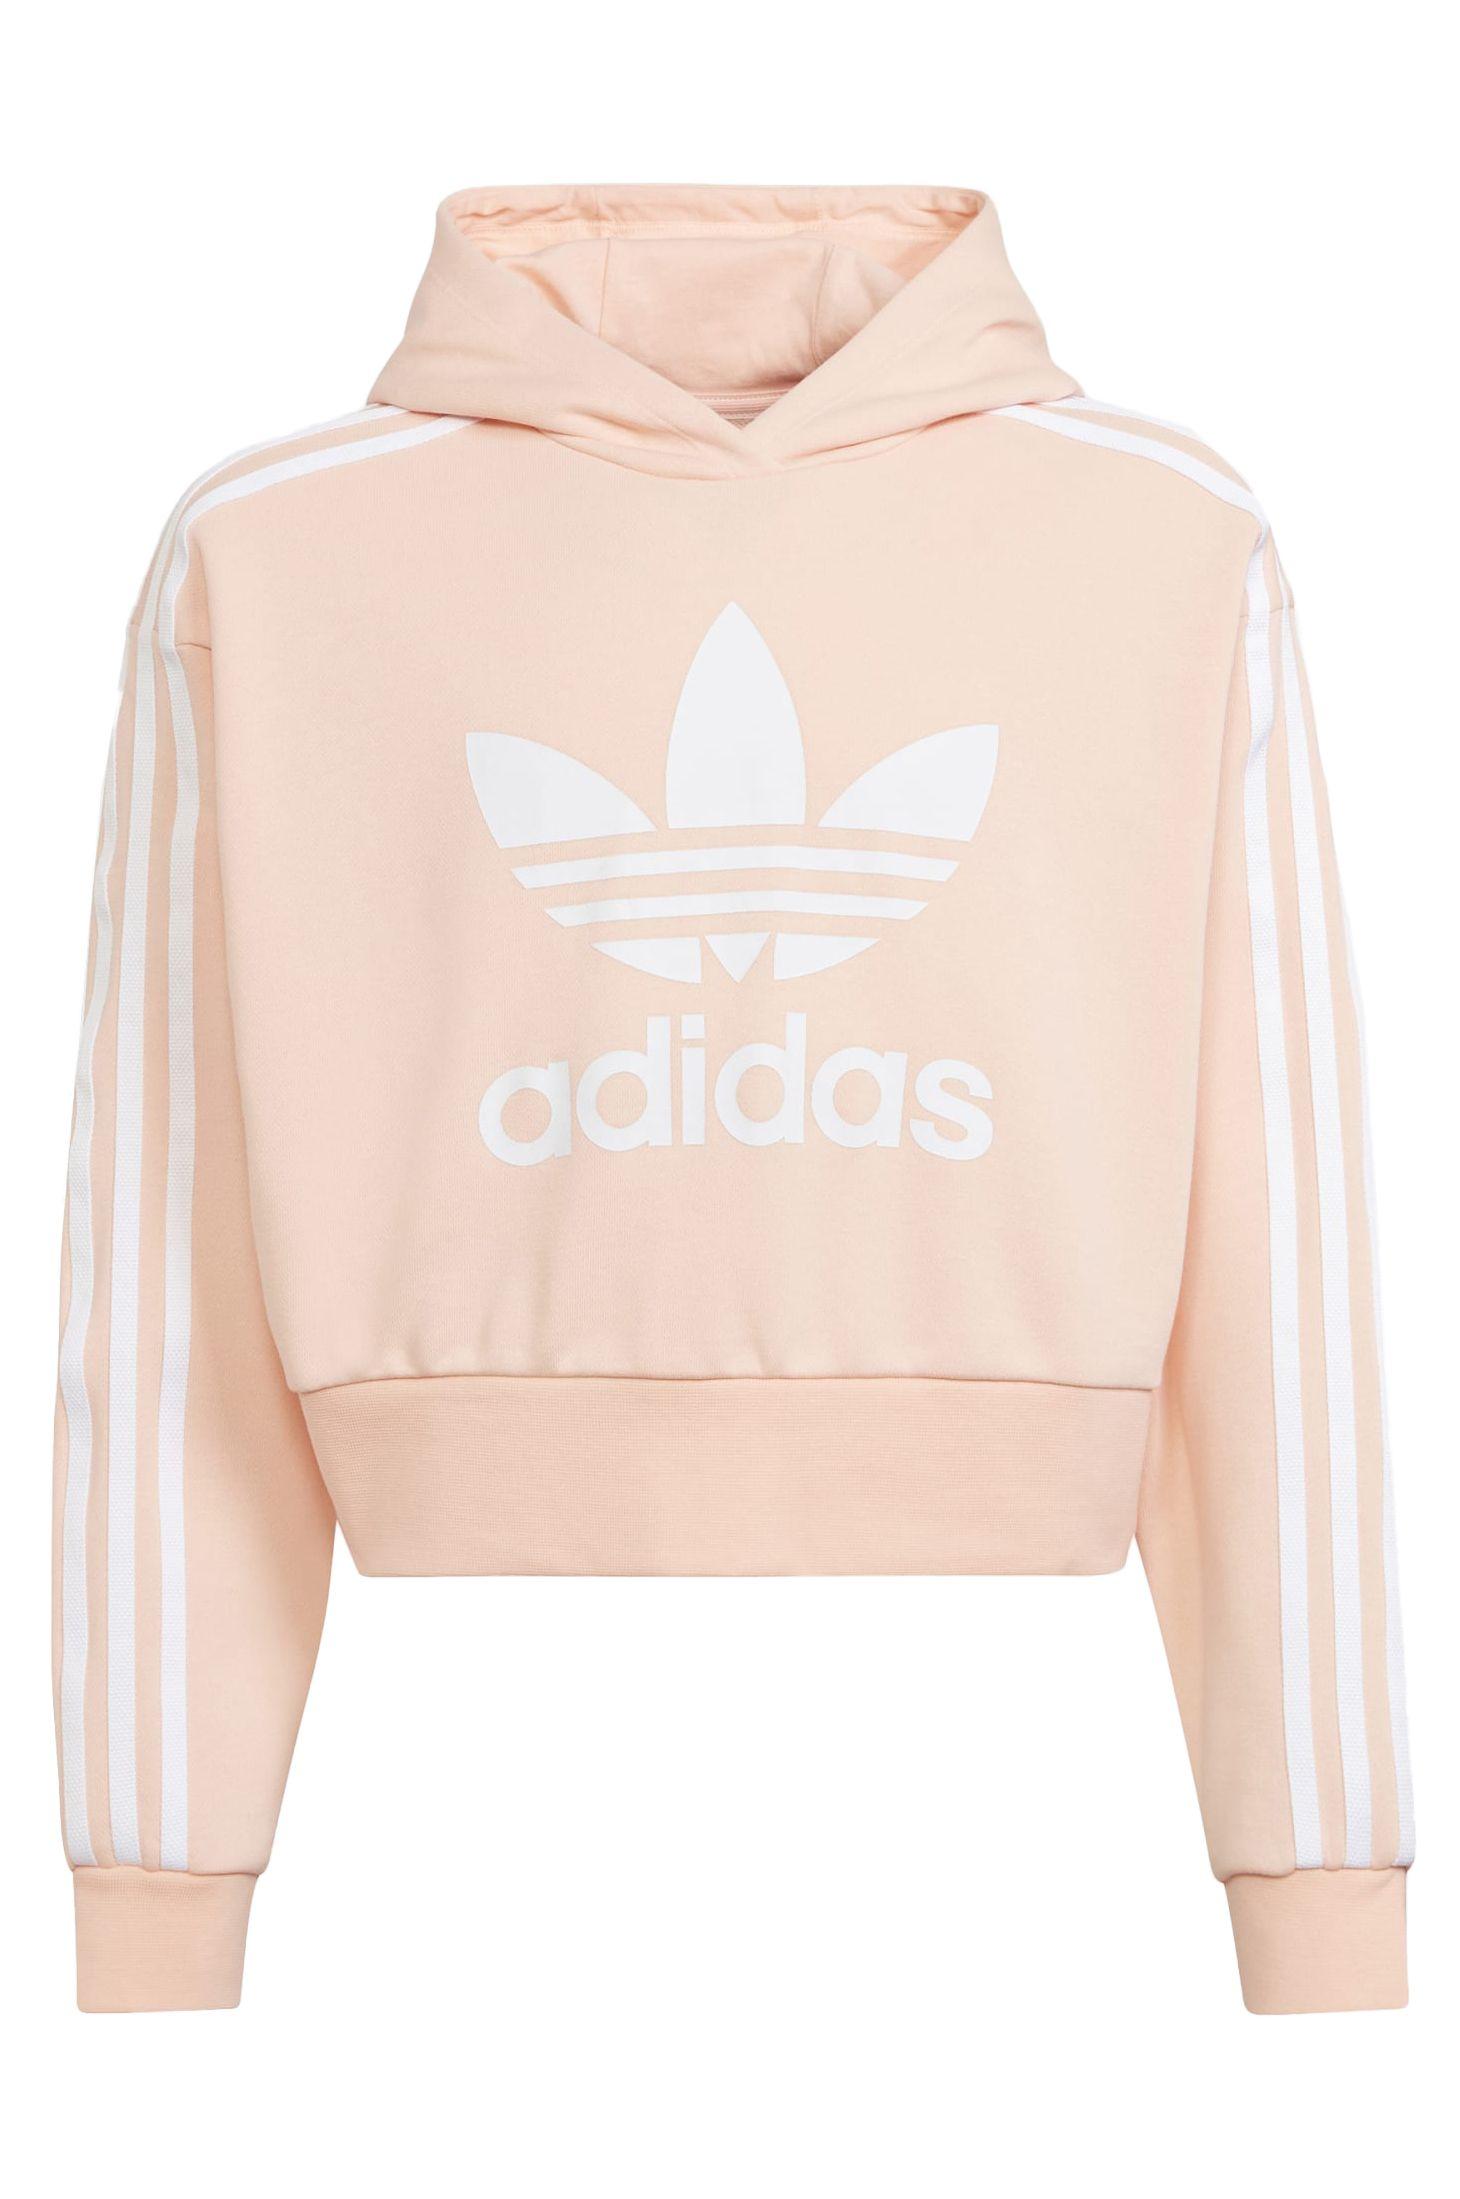 Adidas Sweat Hood ADICOLOR CROPPED HOODIE Haze Coral/White